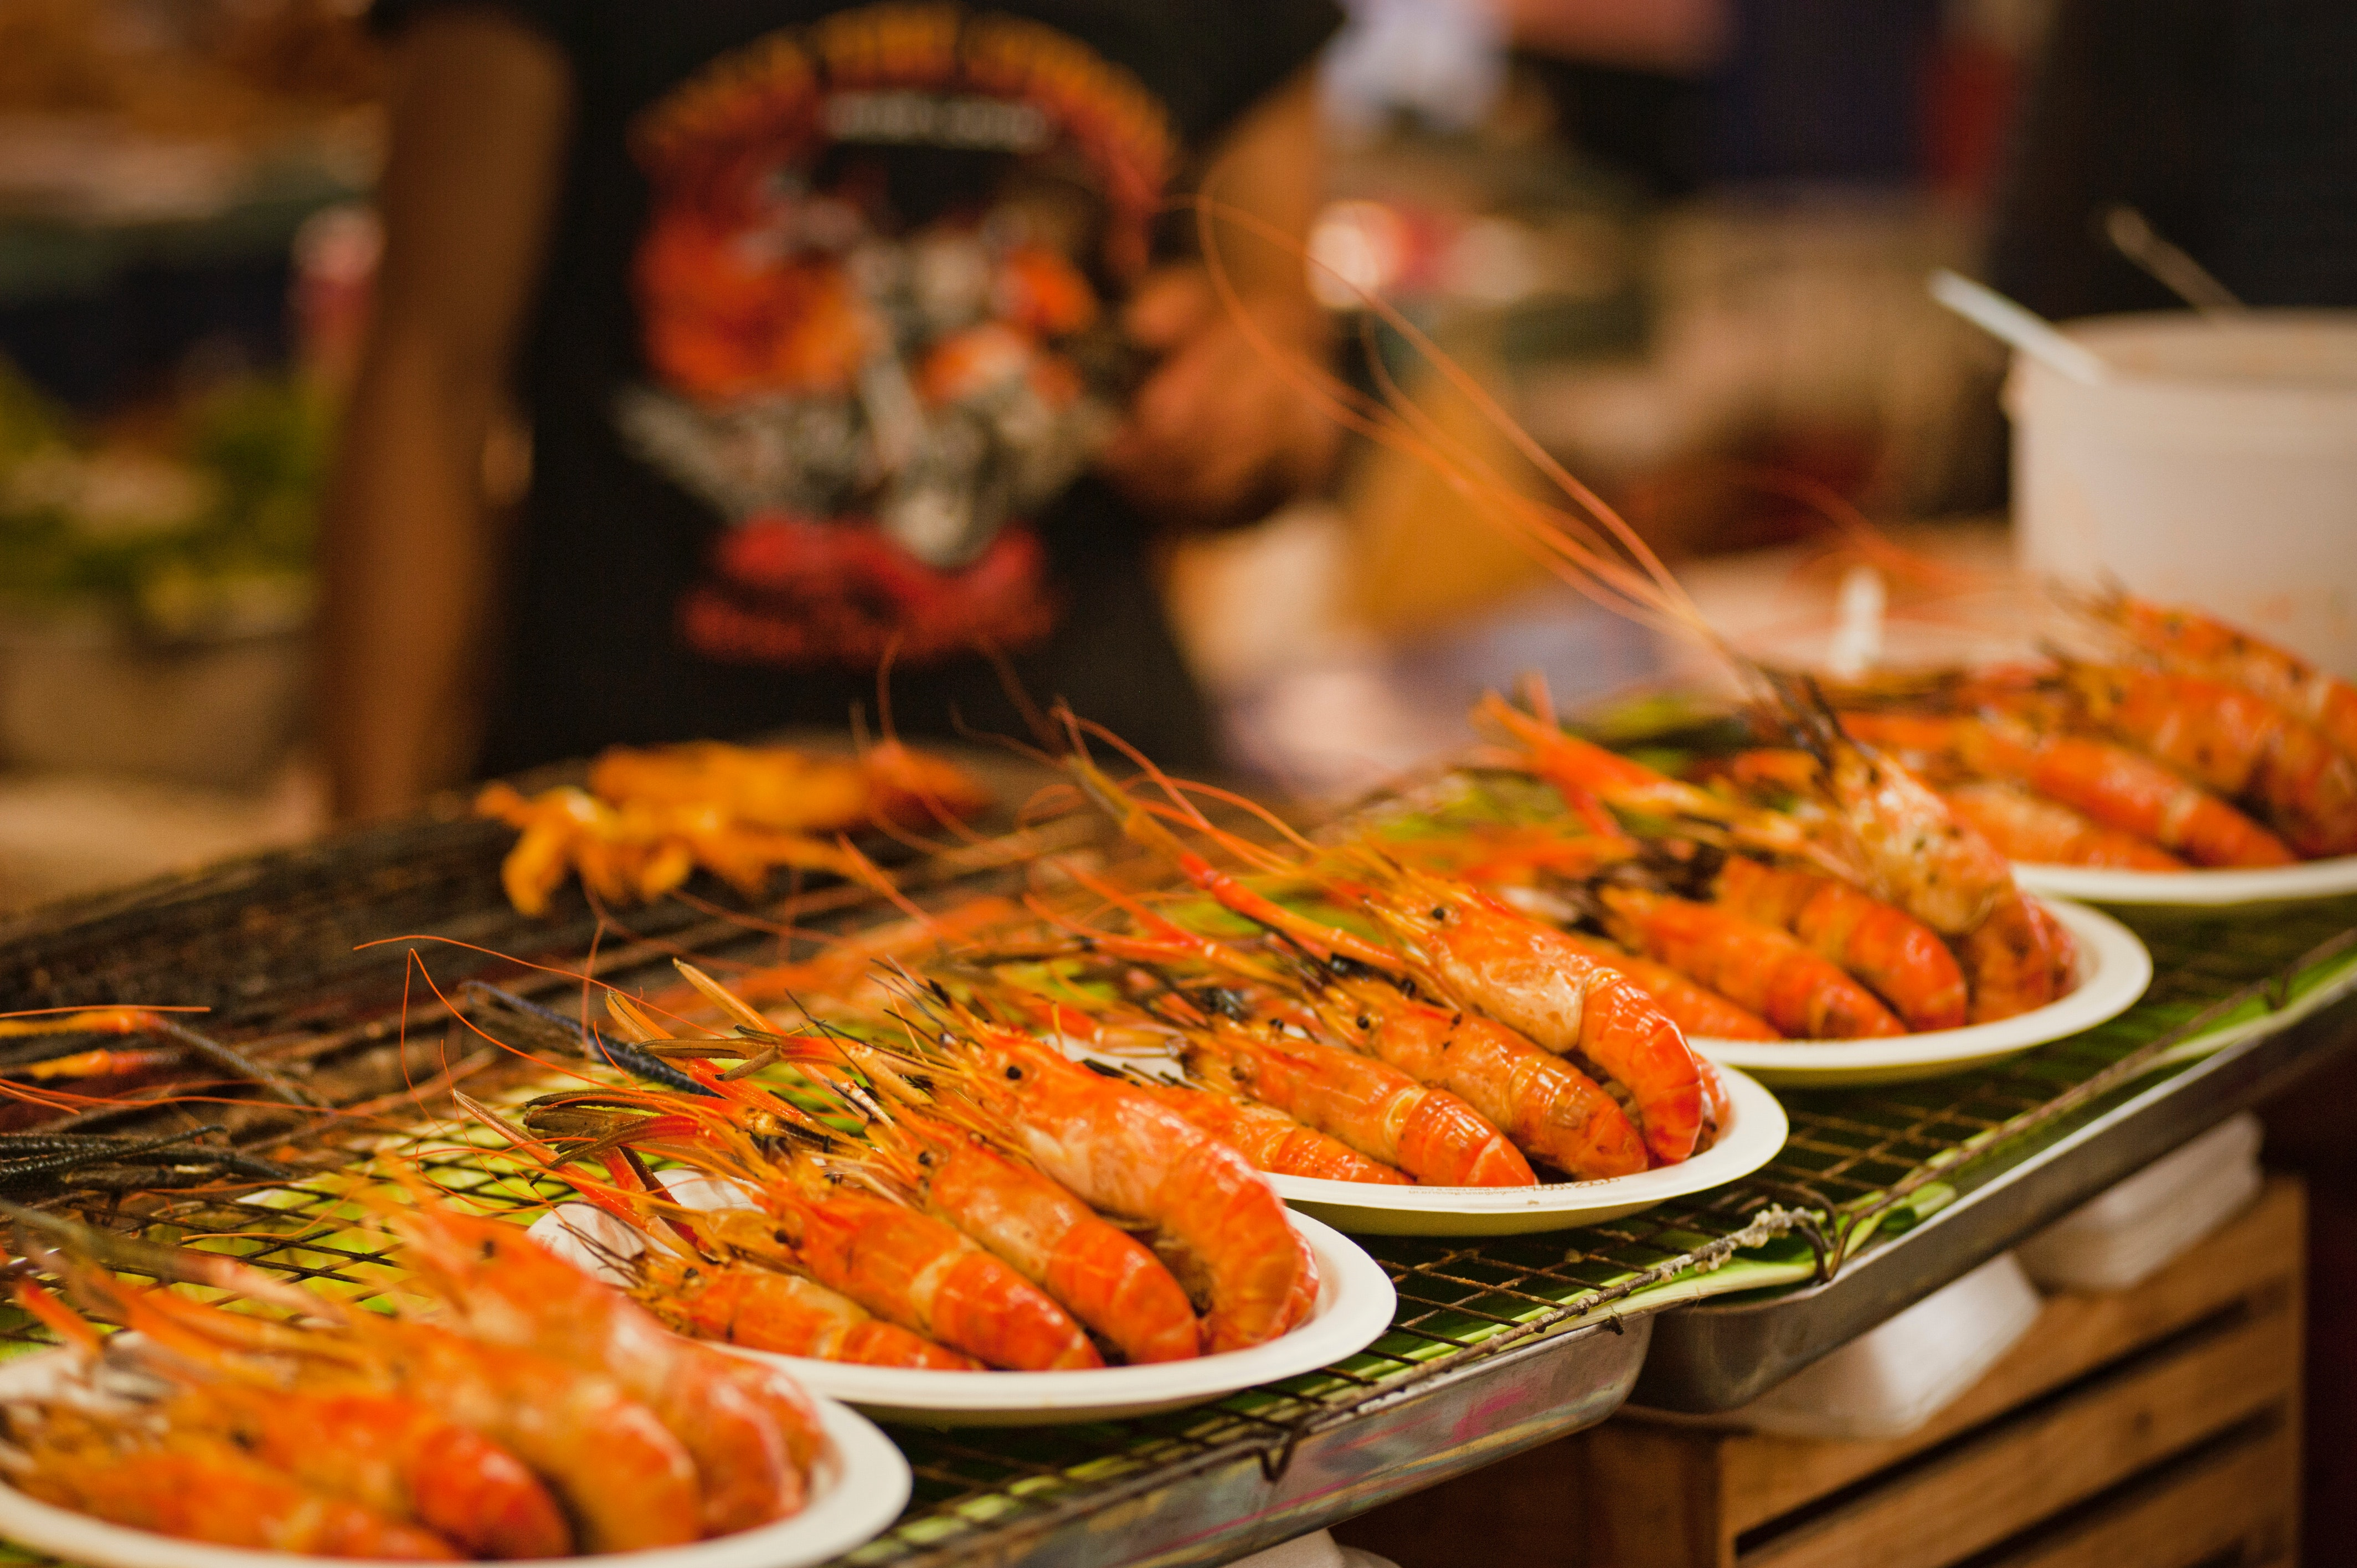 plates of shrimps